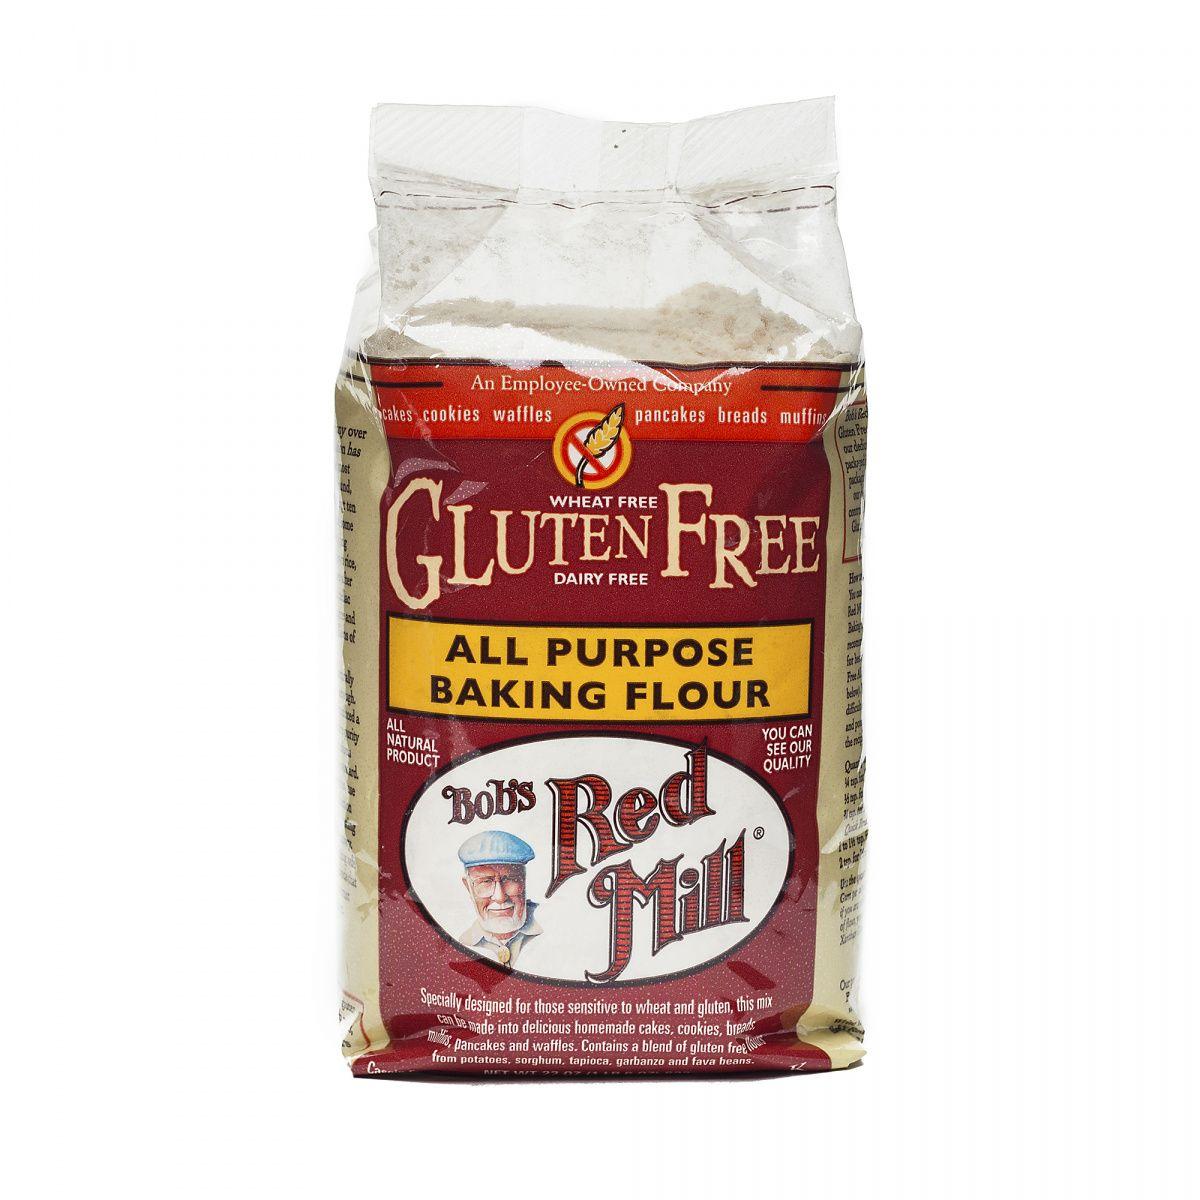 Bob's Red Mill All Purpose Baking Flour, Gluten Free in